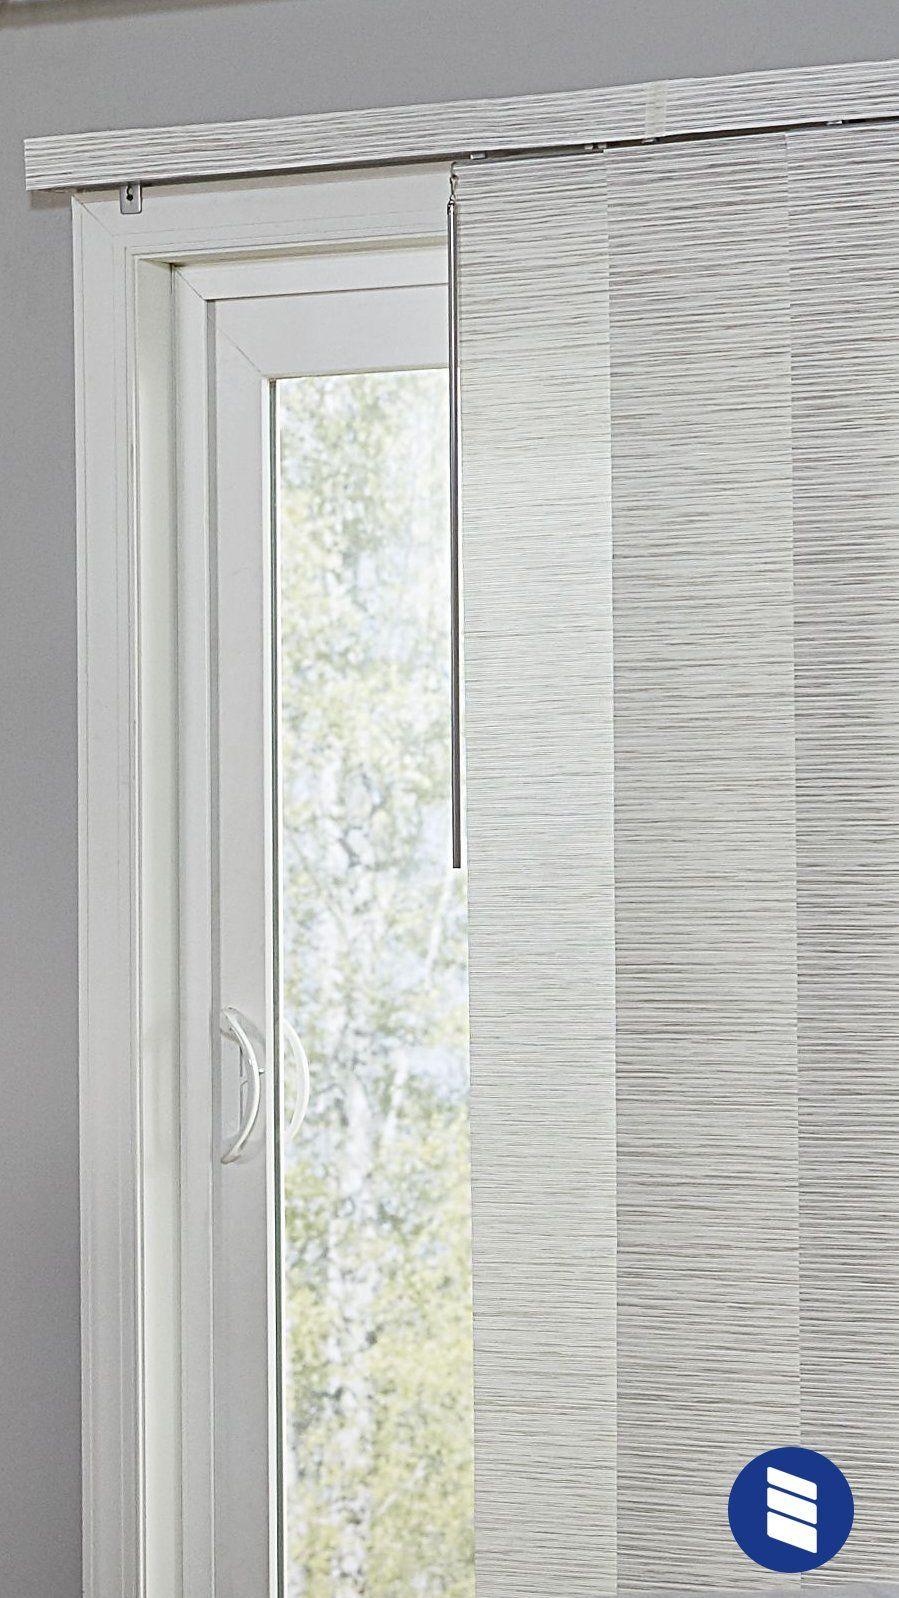 The Best Vertical Blinds Alternatives For Sliding Glass Doors Blinds Com Sliding Glass Door Window Treatments Vertical Blinds Alternative Door Coverings